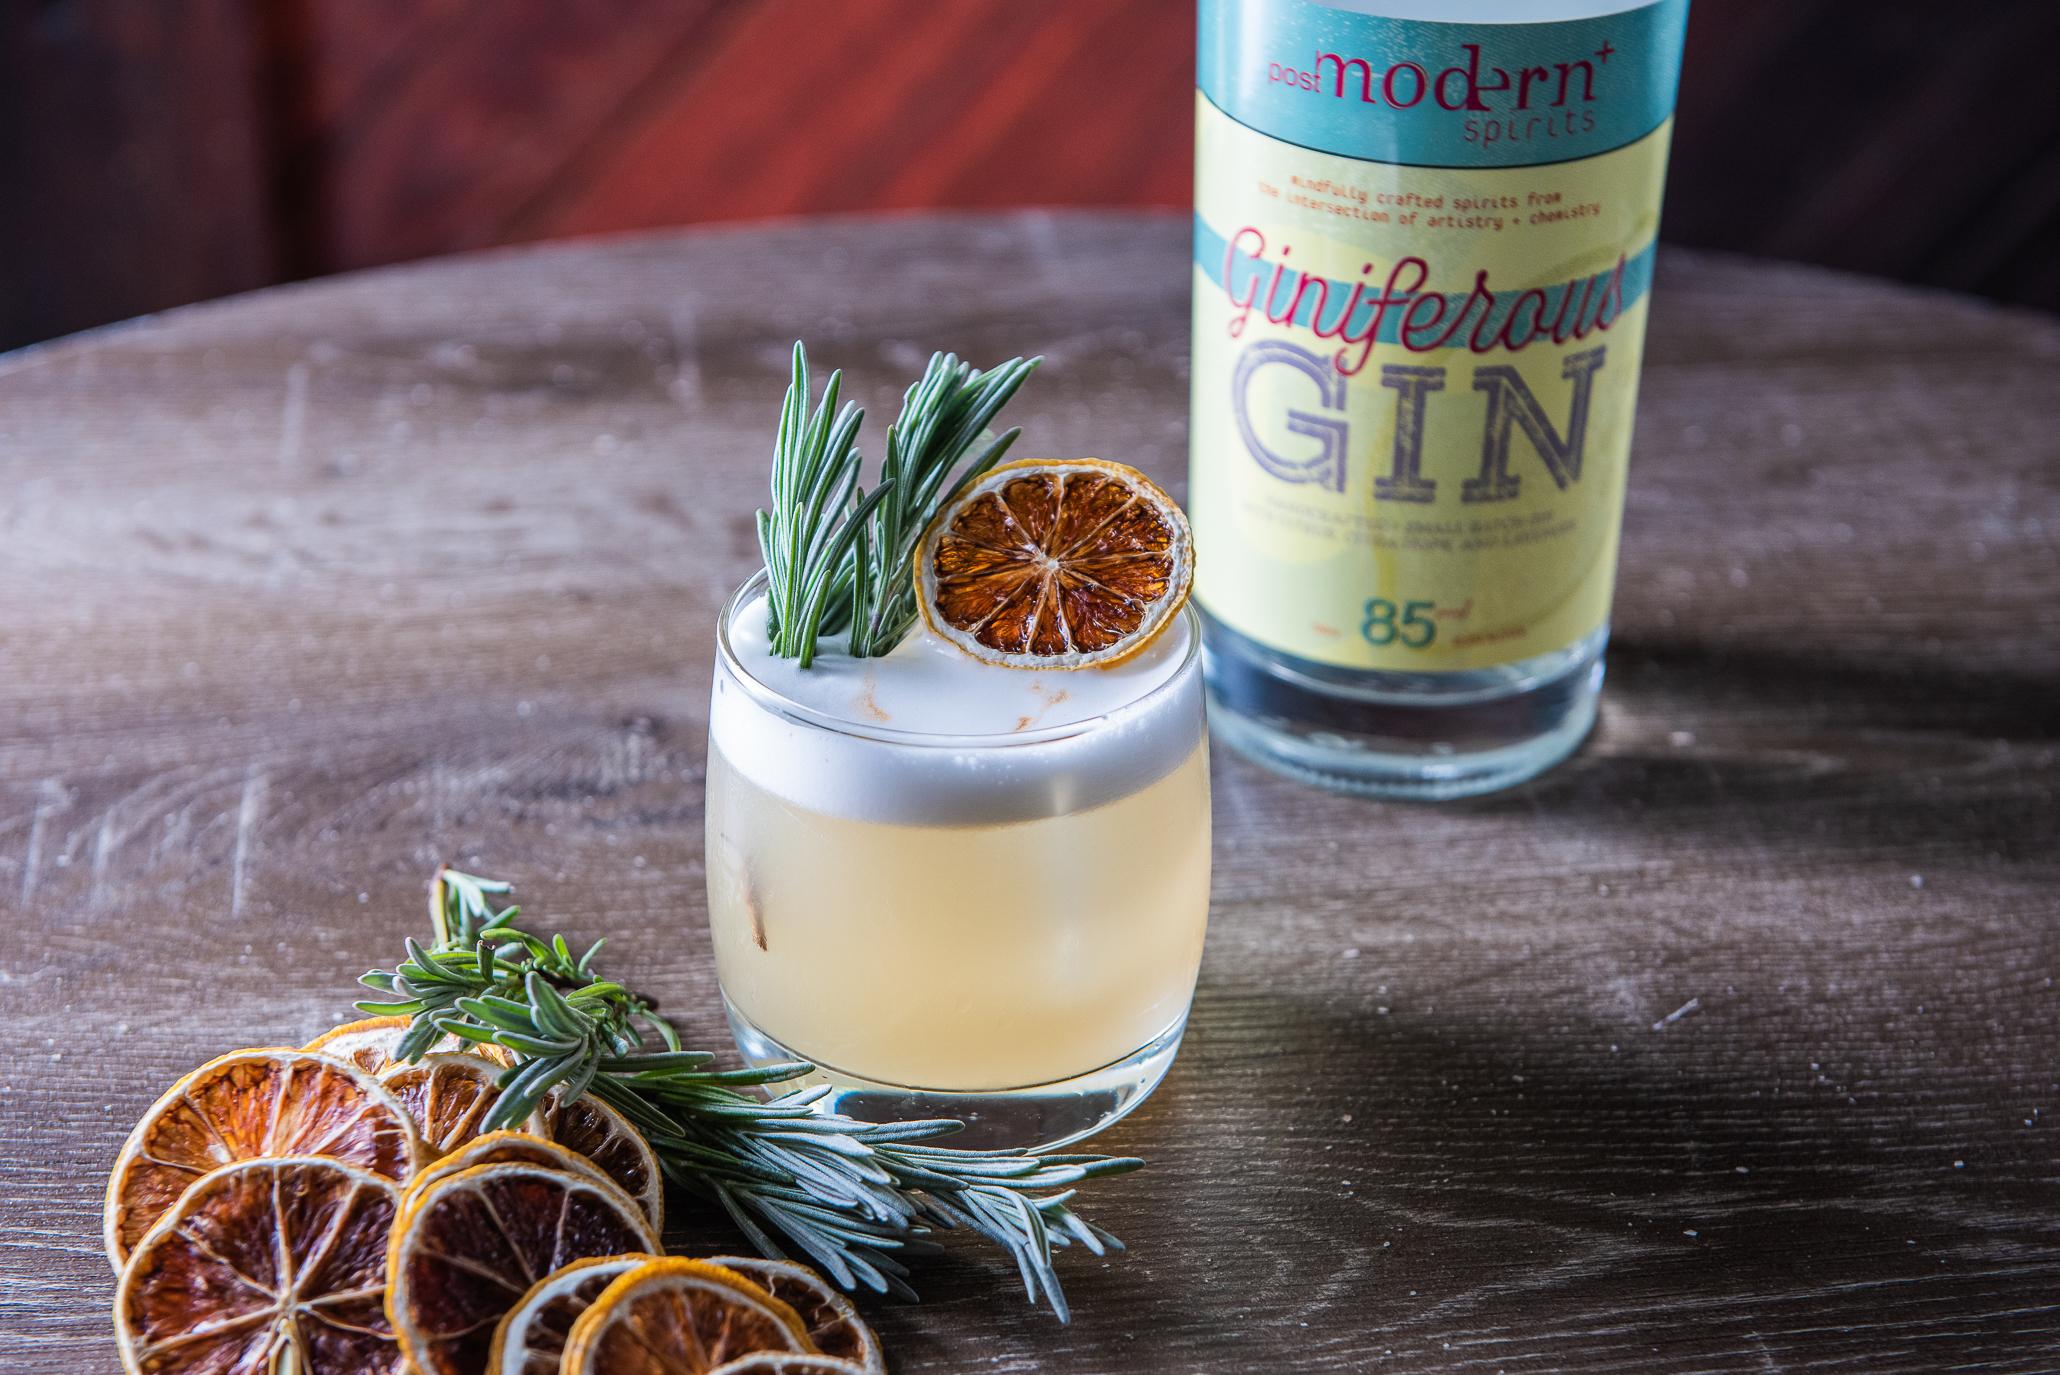 PostModern Spirits Gin